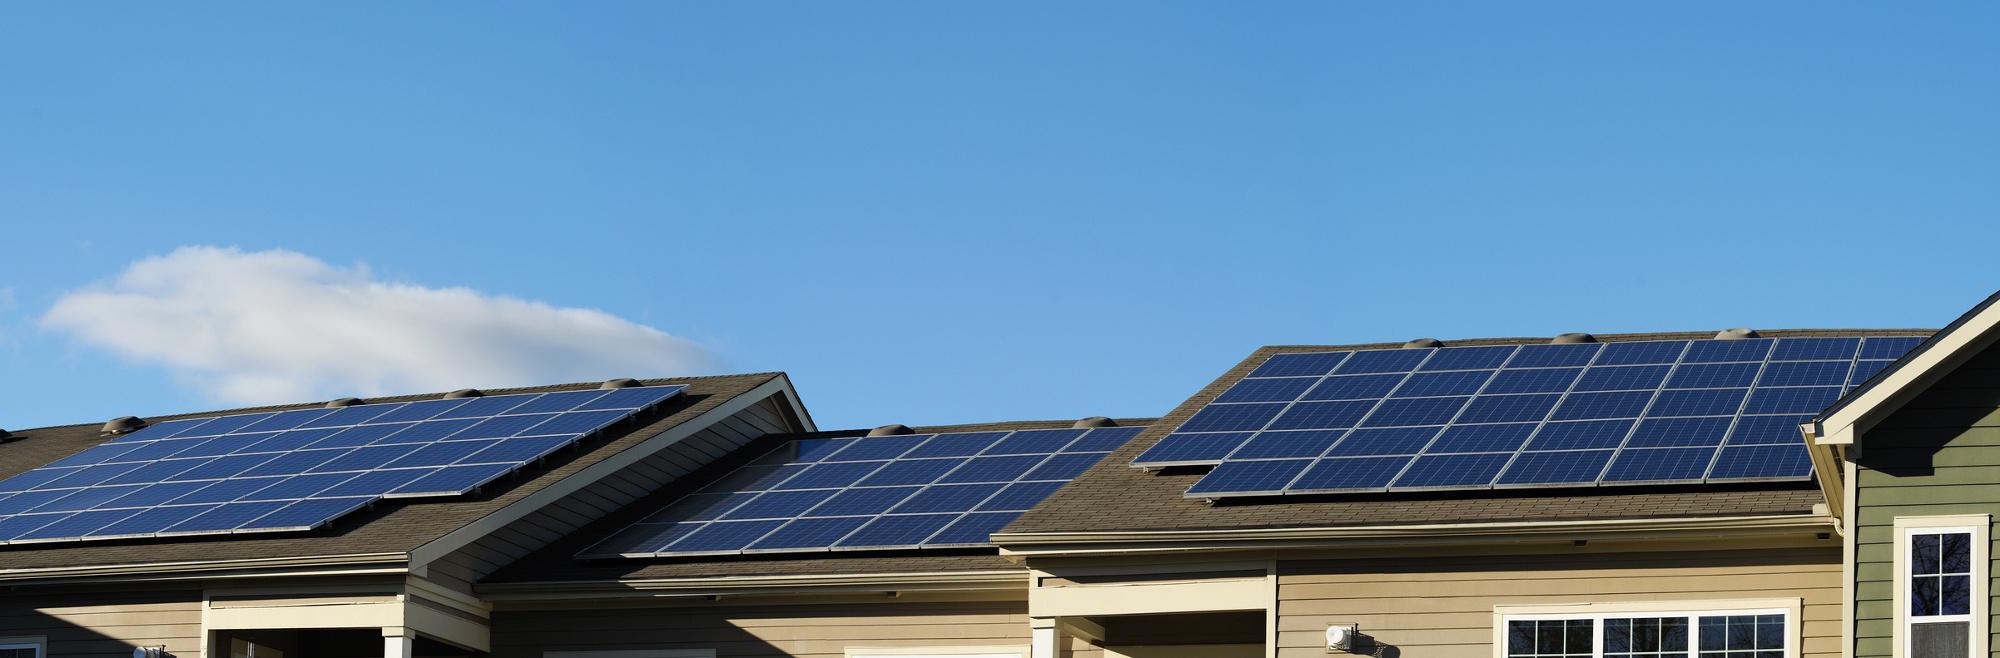 Grosse installation photovoltaïque BATIECOTHERM